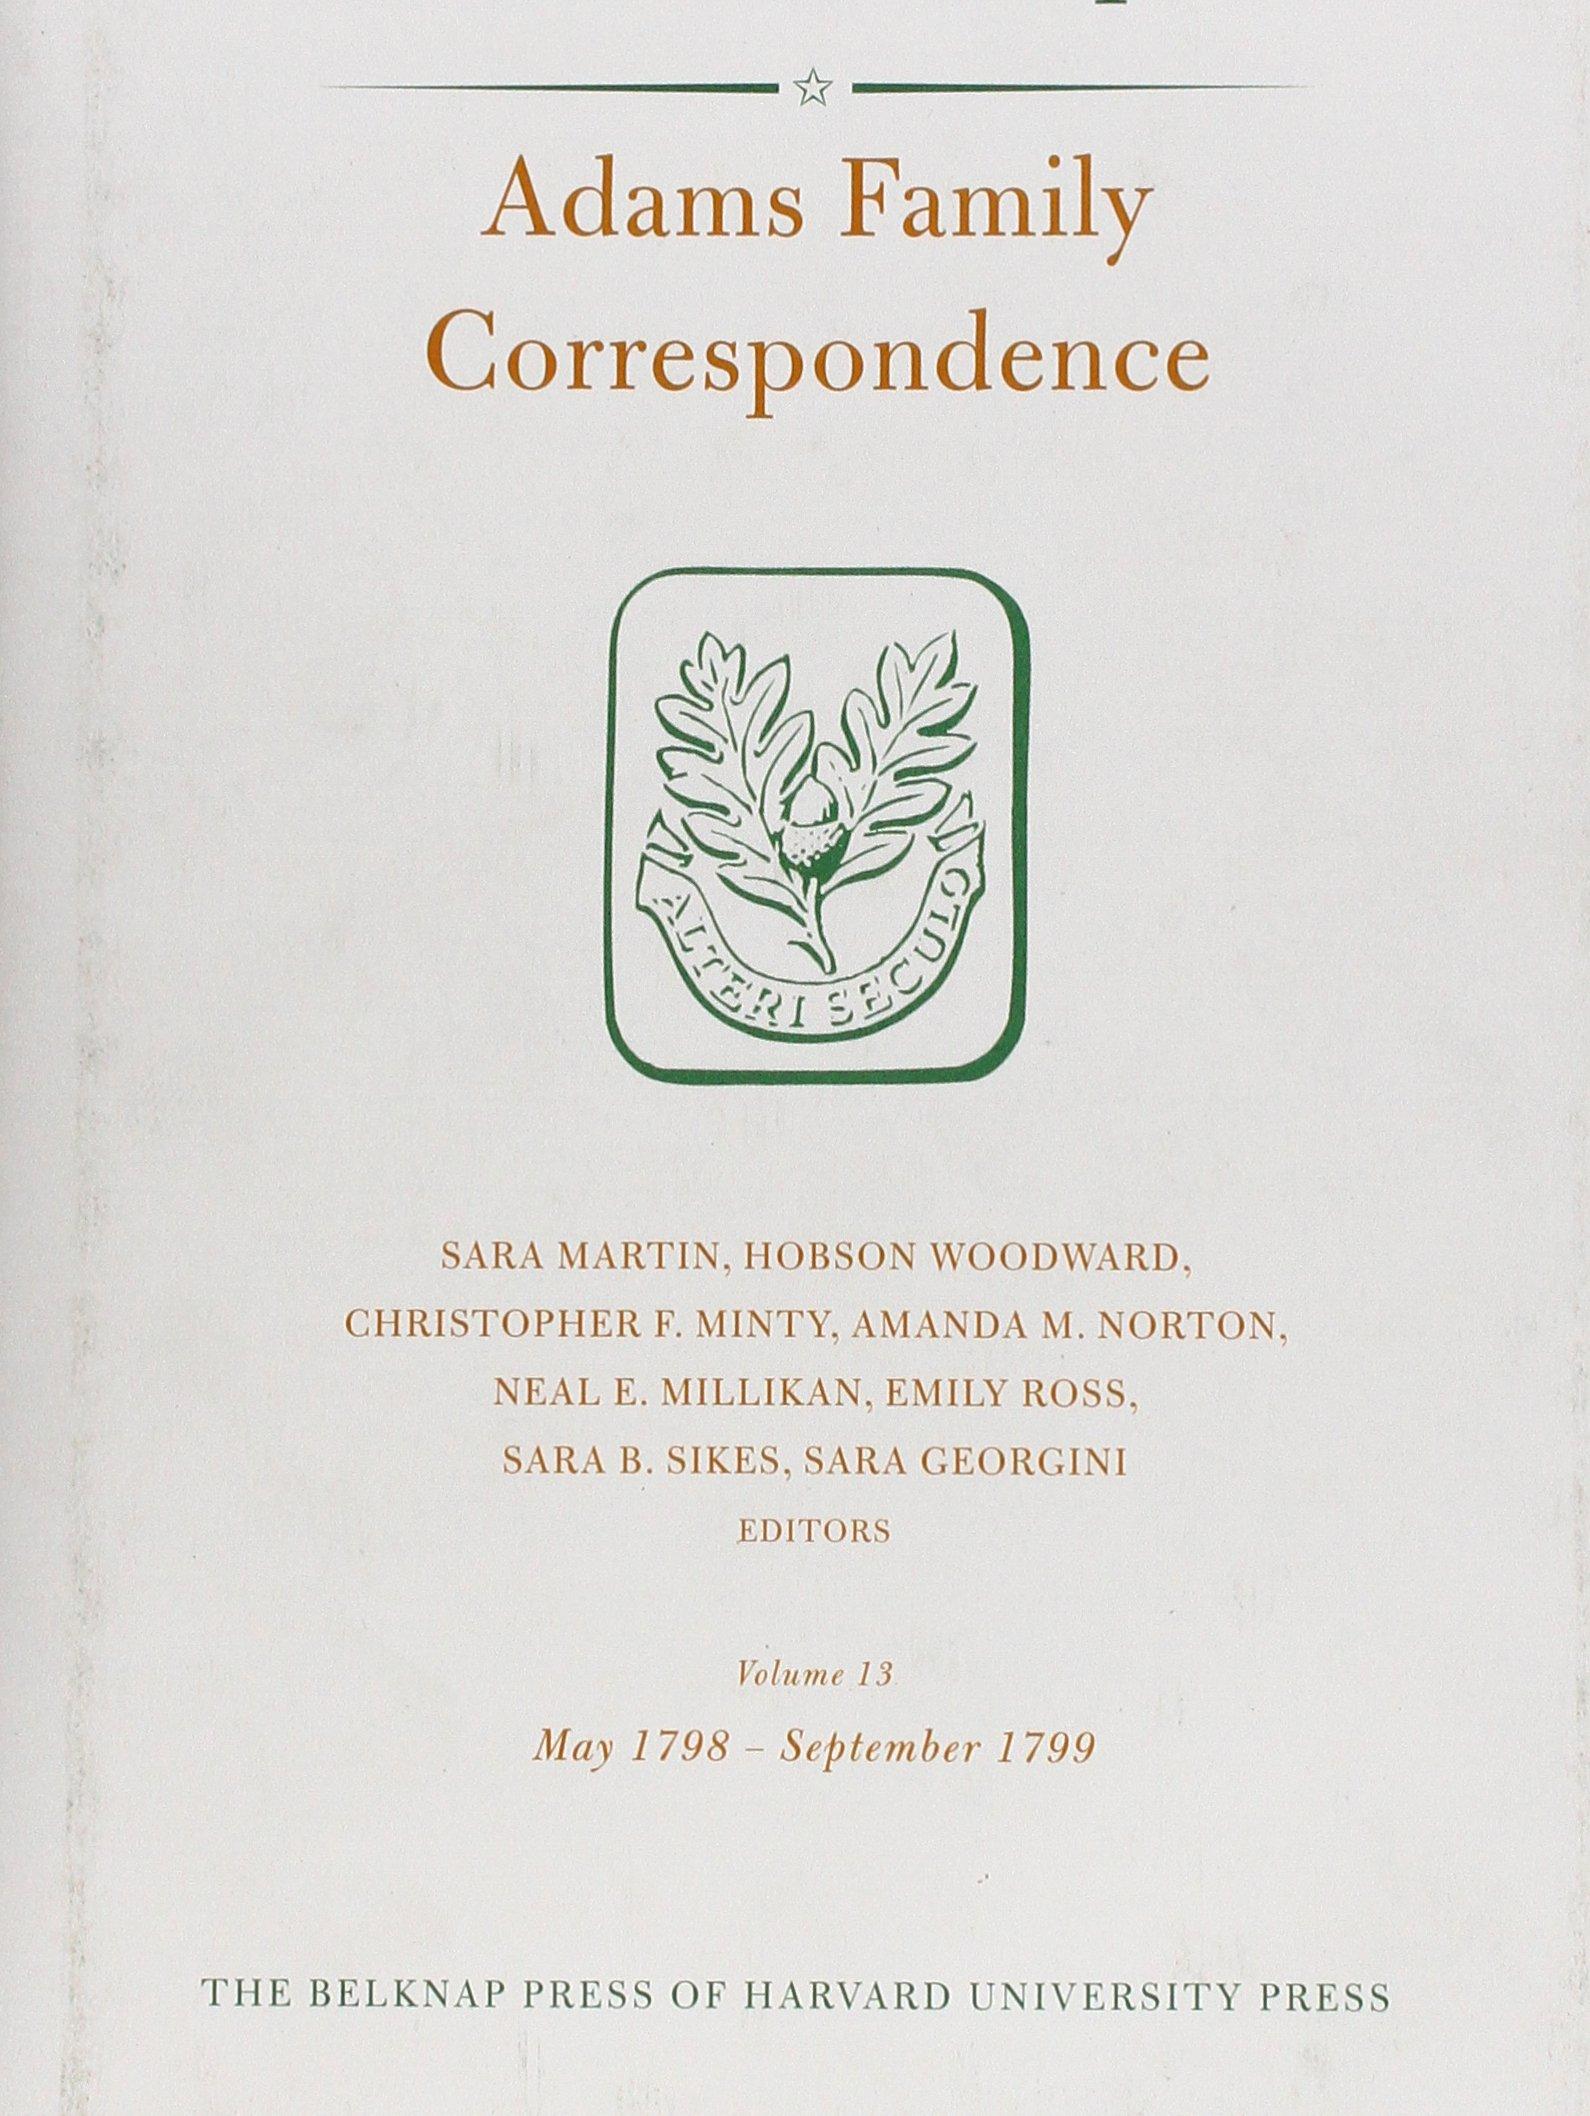 Adams Family Correspondence, Volume 13: May 1798 – September 1799 (Adams Papers) pdf